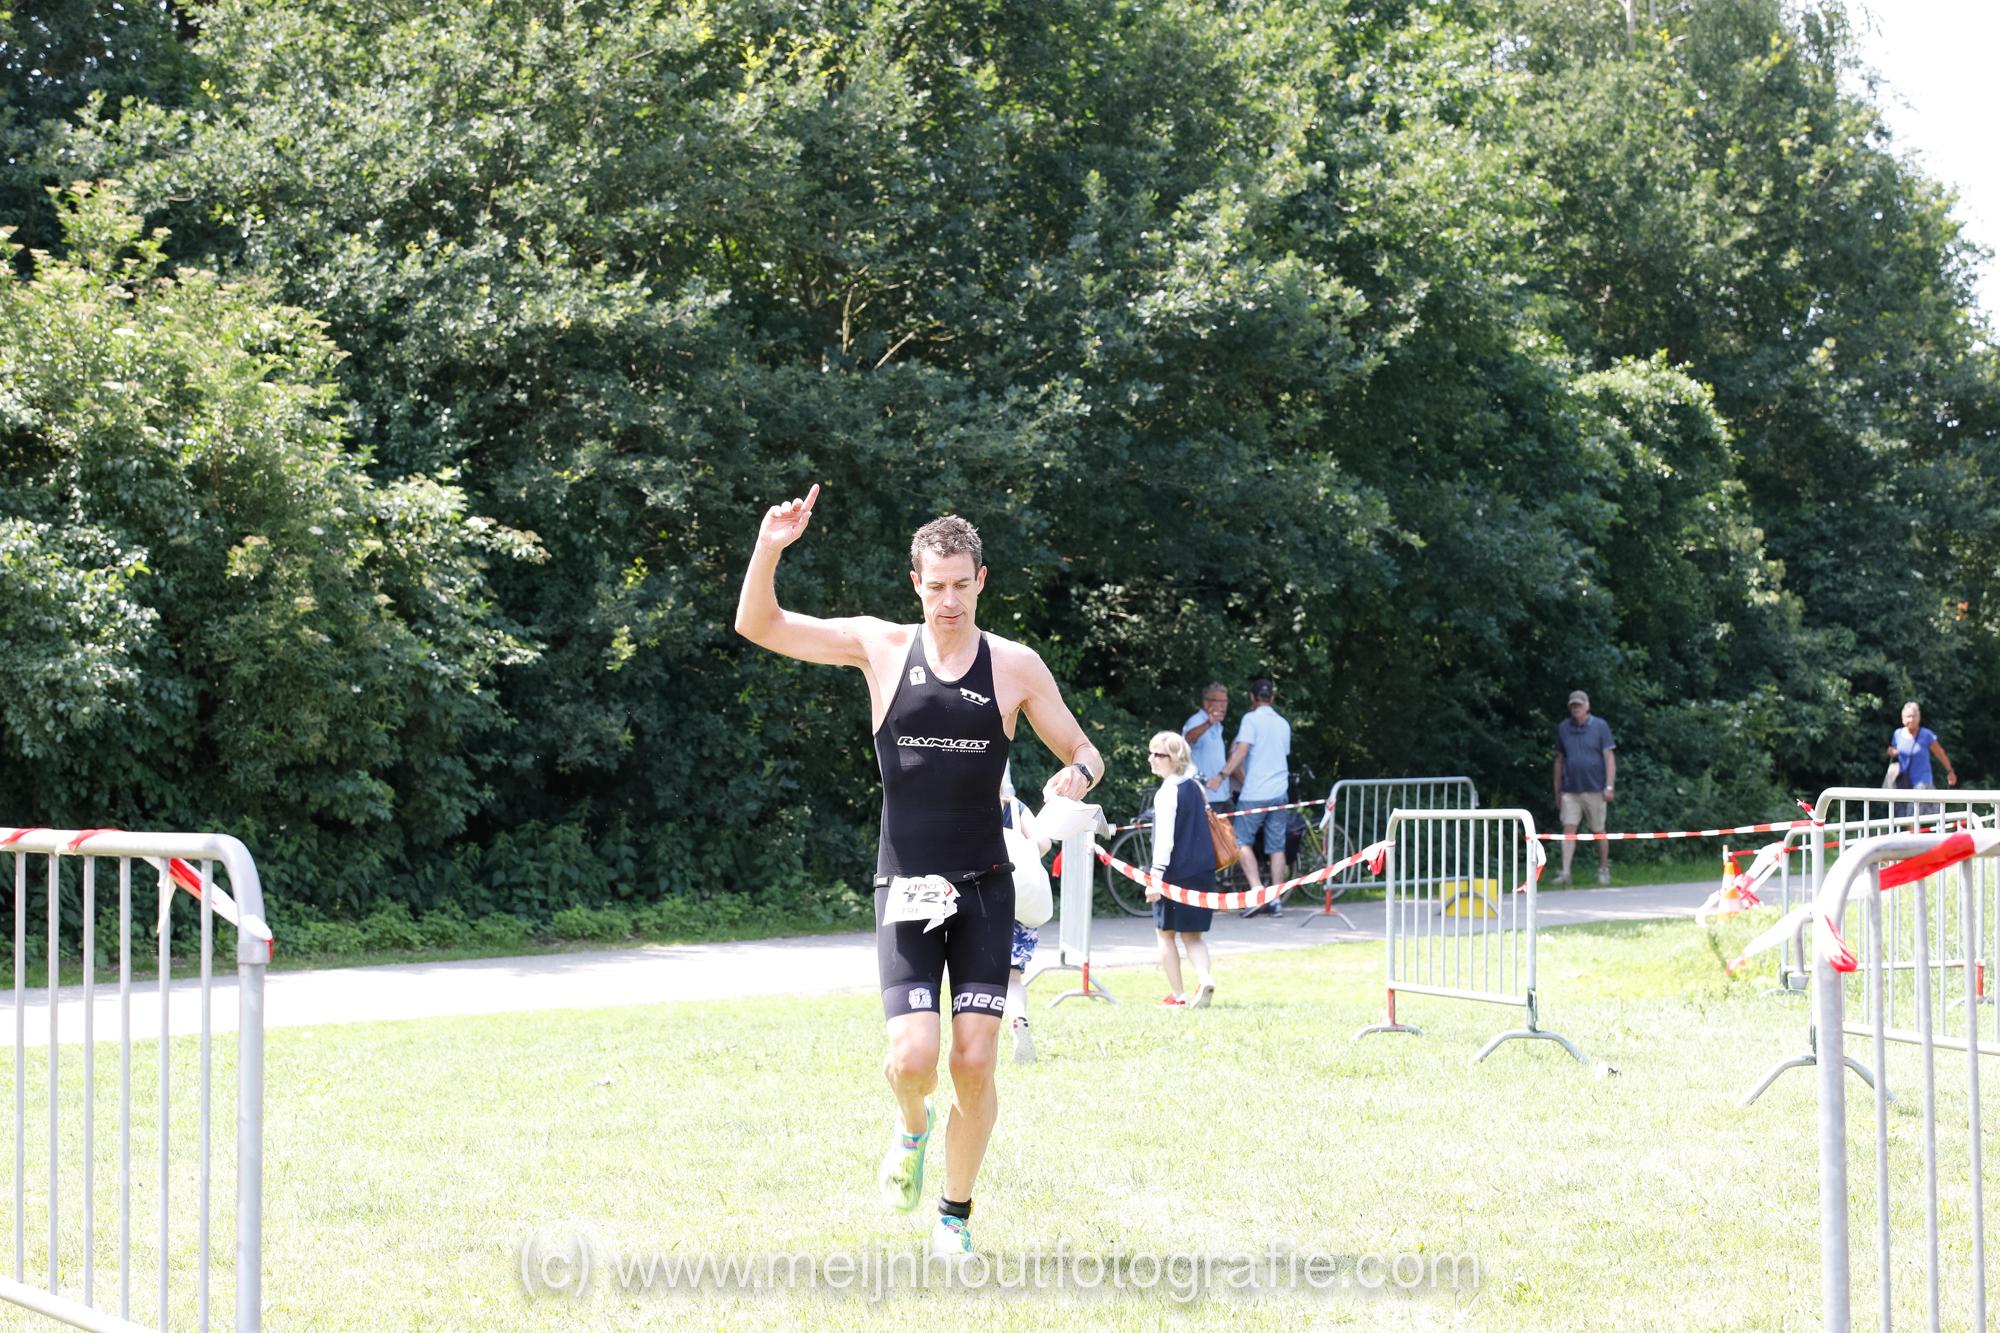 _MG_8882 Triathlon Huizen 2018 #5.jpg